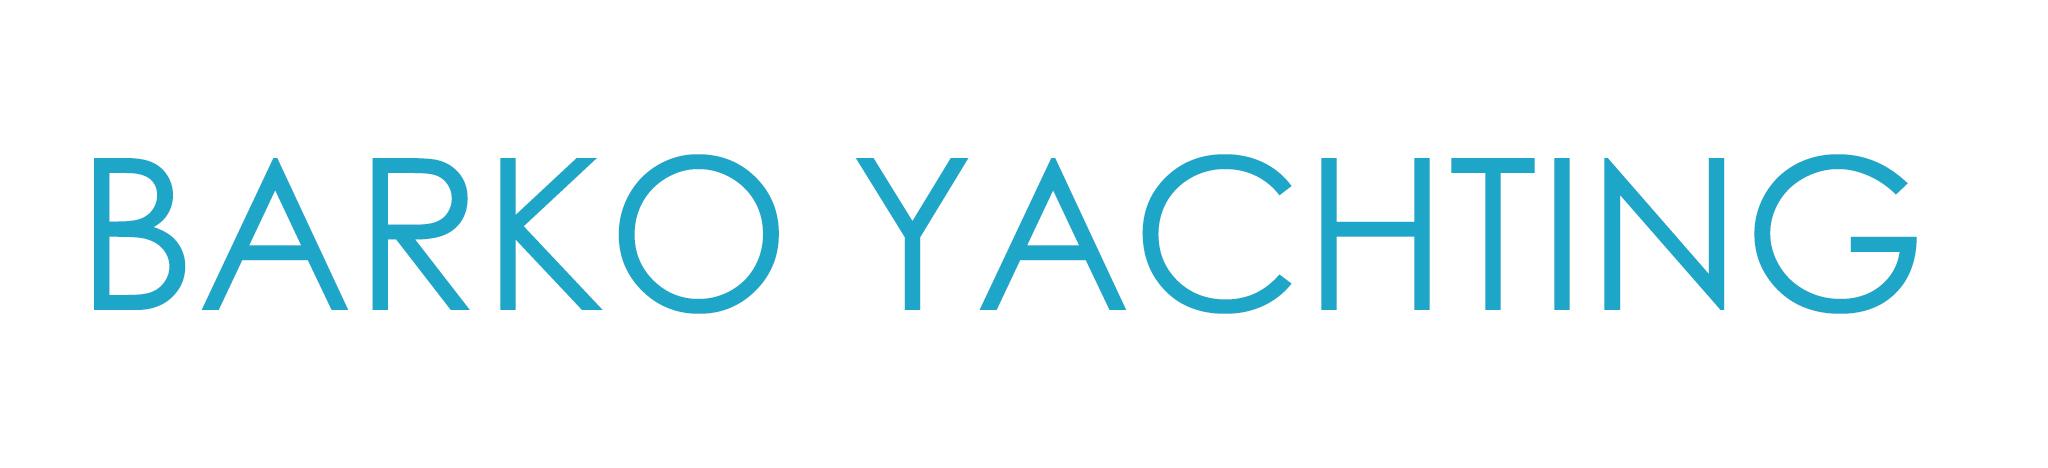 Barko Yachting